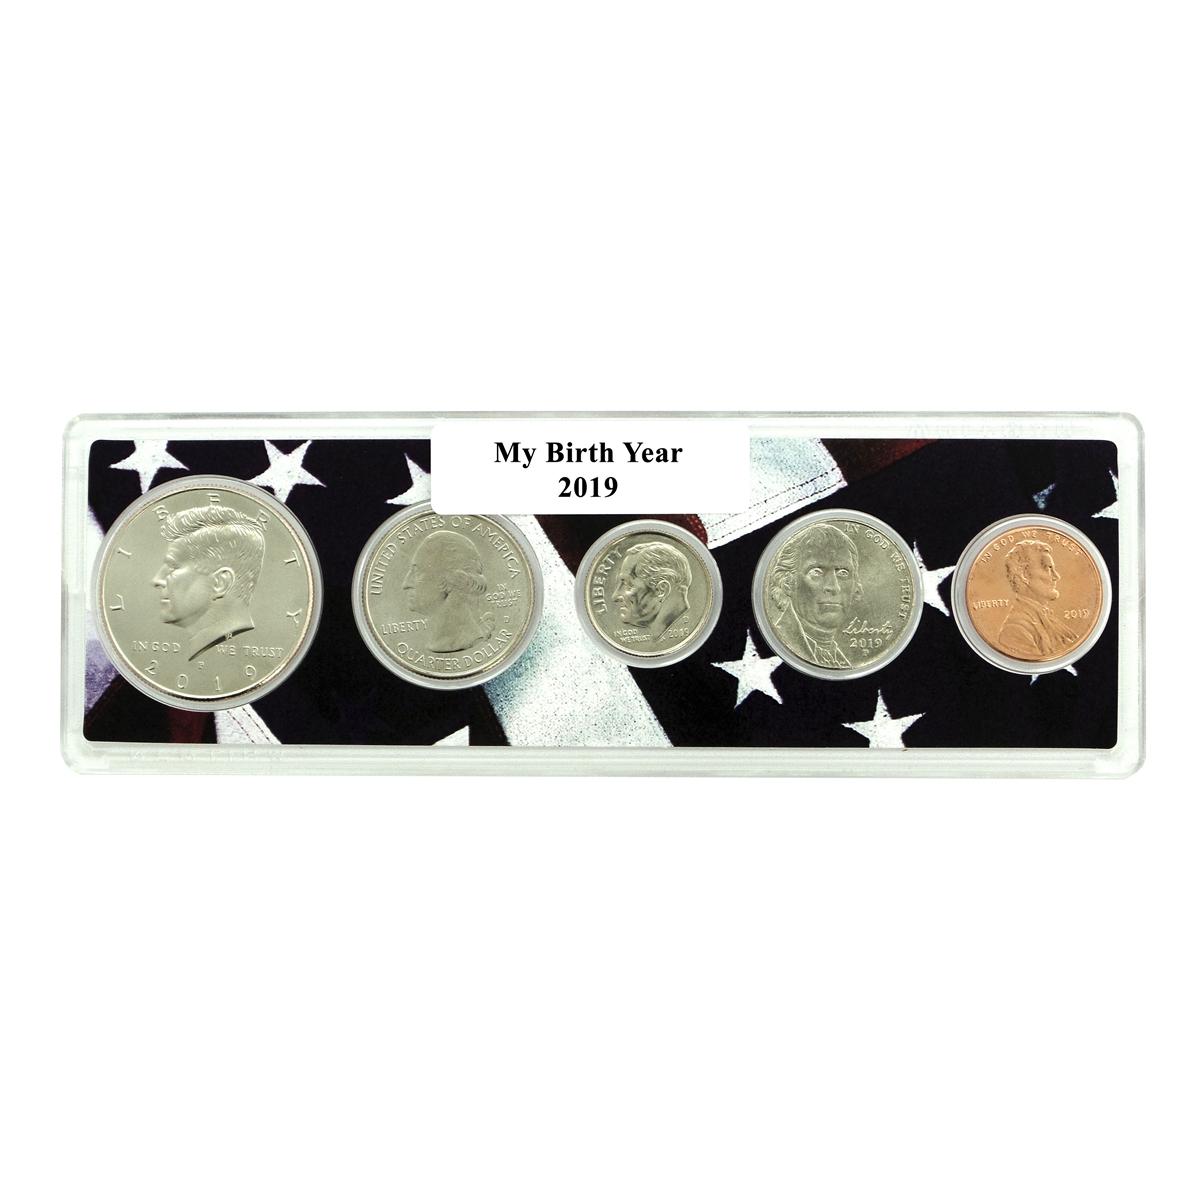 2019 US Mint Birth Set Proof Coin Set 19RD